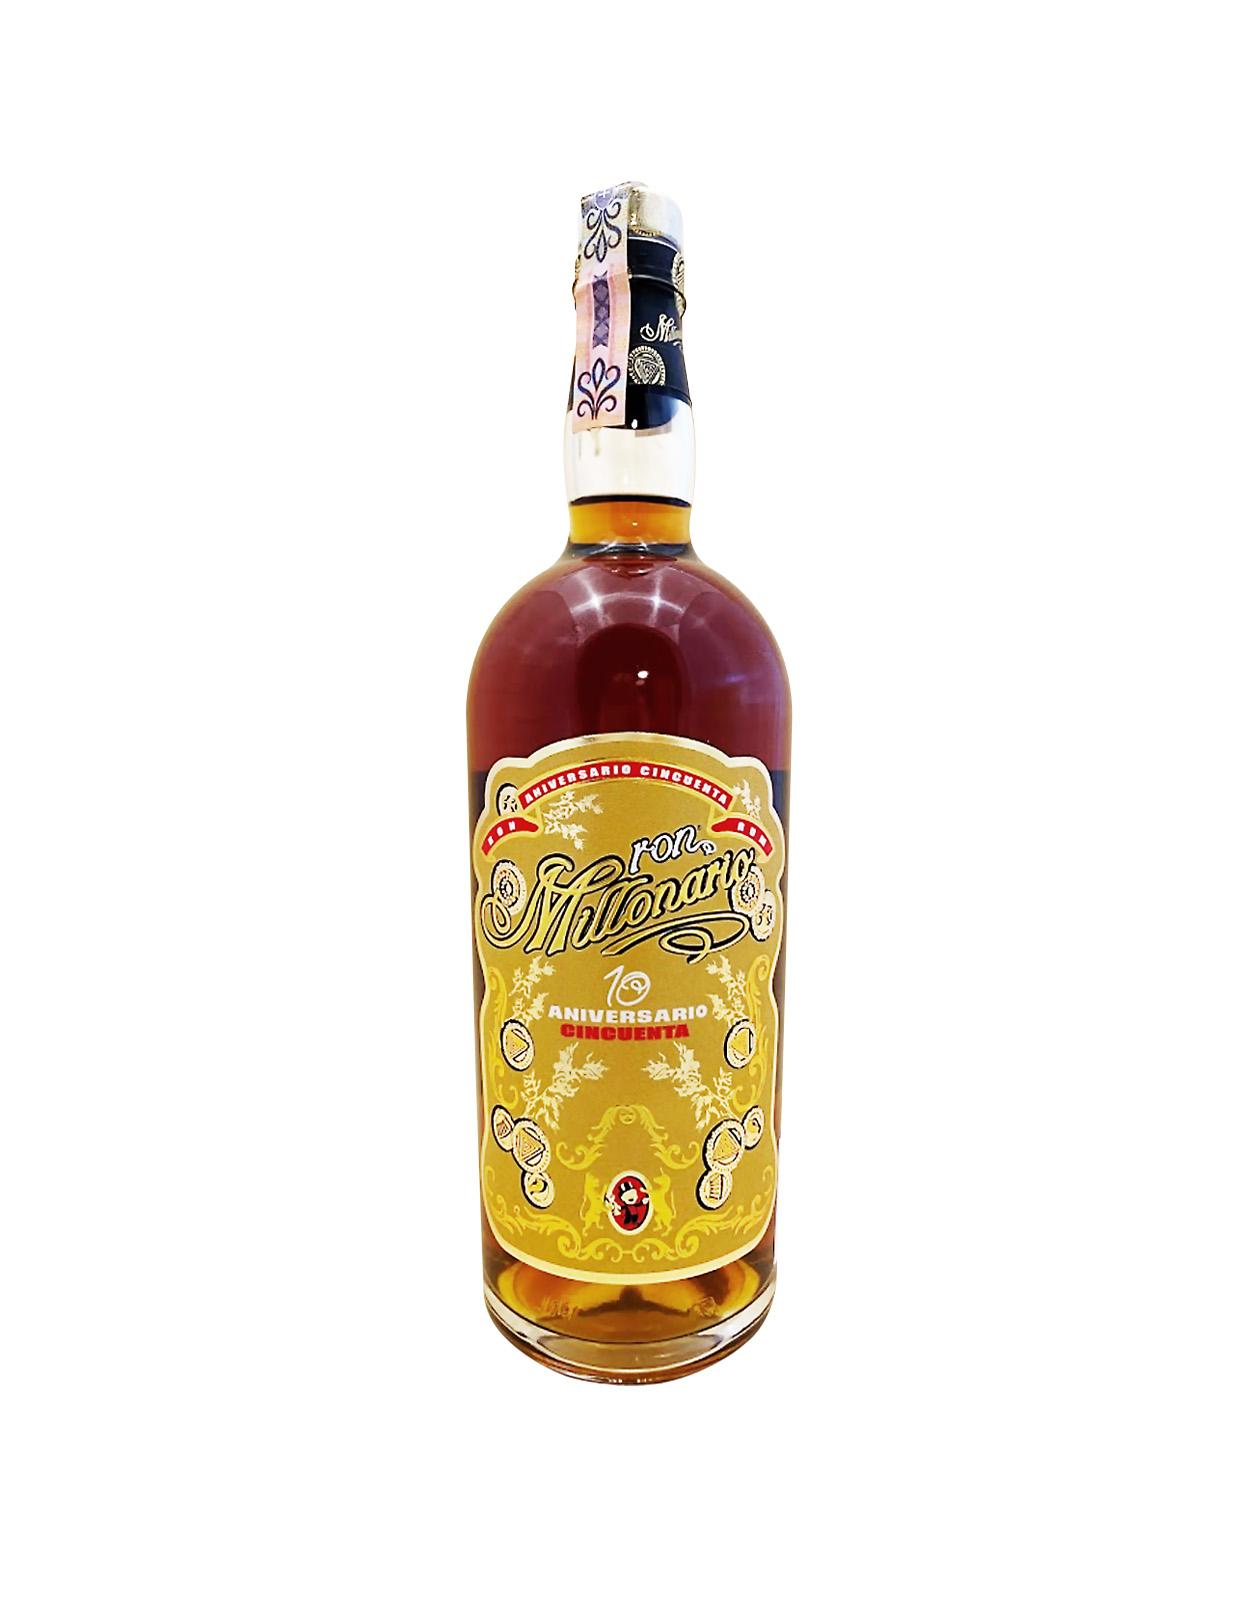 Milionario Ron 10YO Rum, bottle shop Sunny wines, vinotéka Slnečnice Petržalka, rozvoz eshop